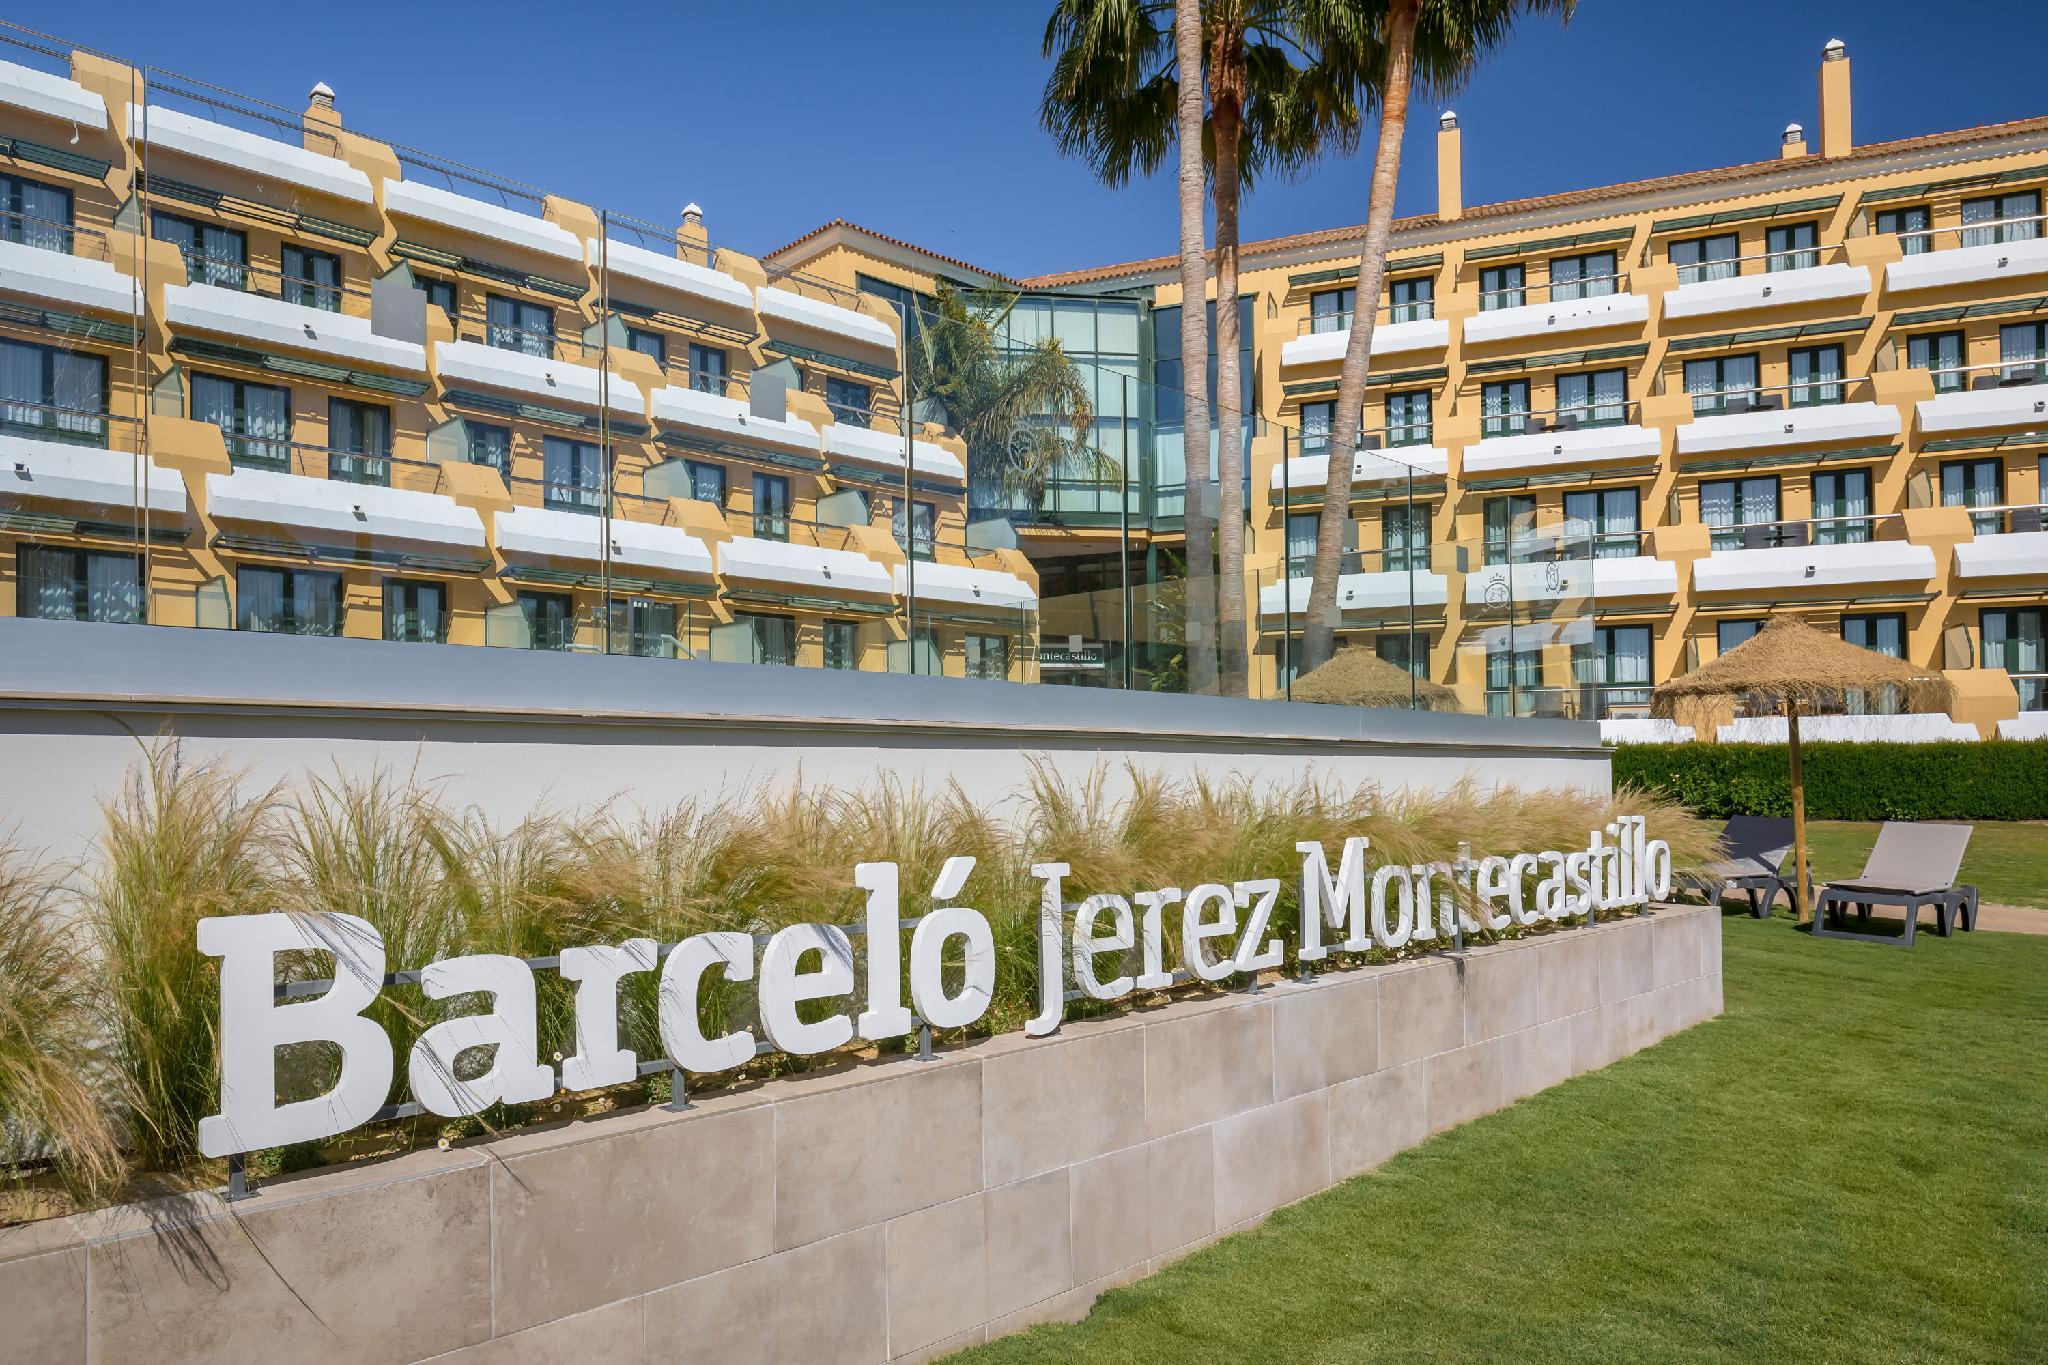 Hotel Barcelo Jerez Montecastillo And Convention Center